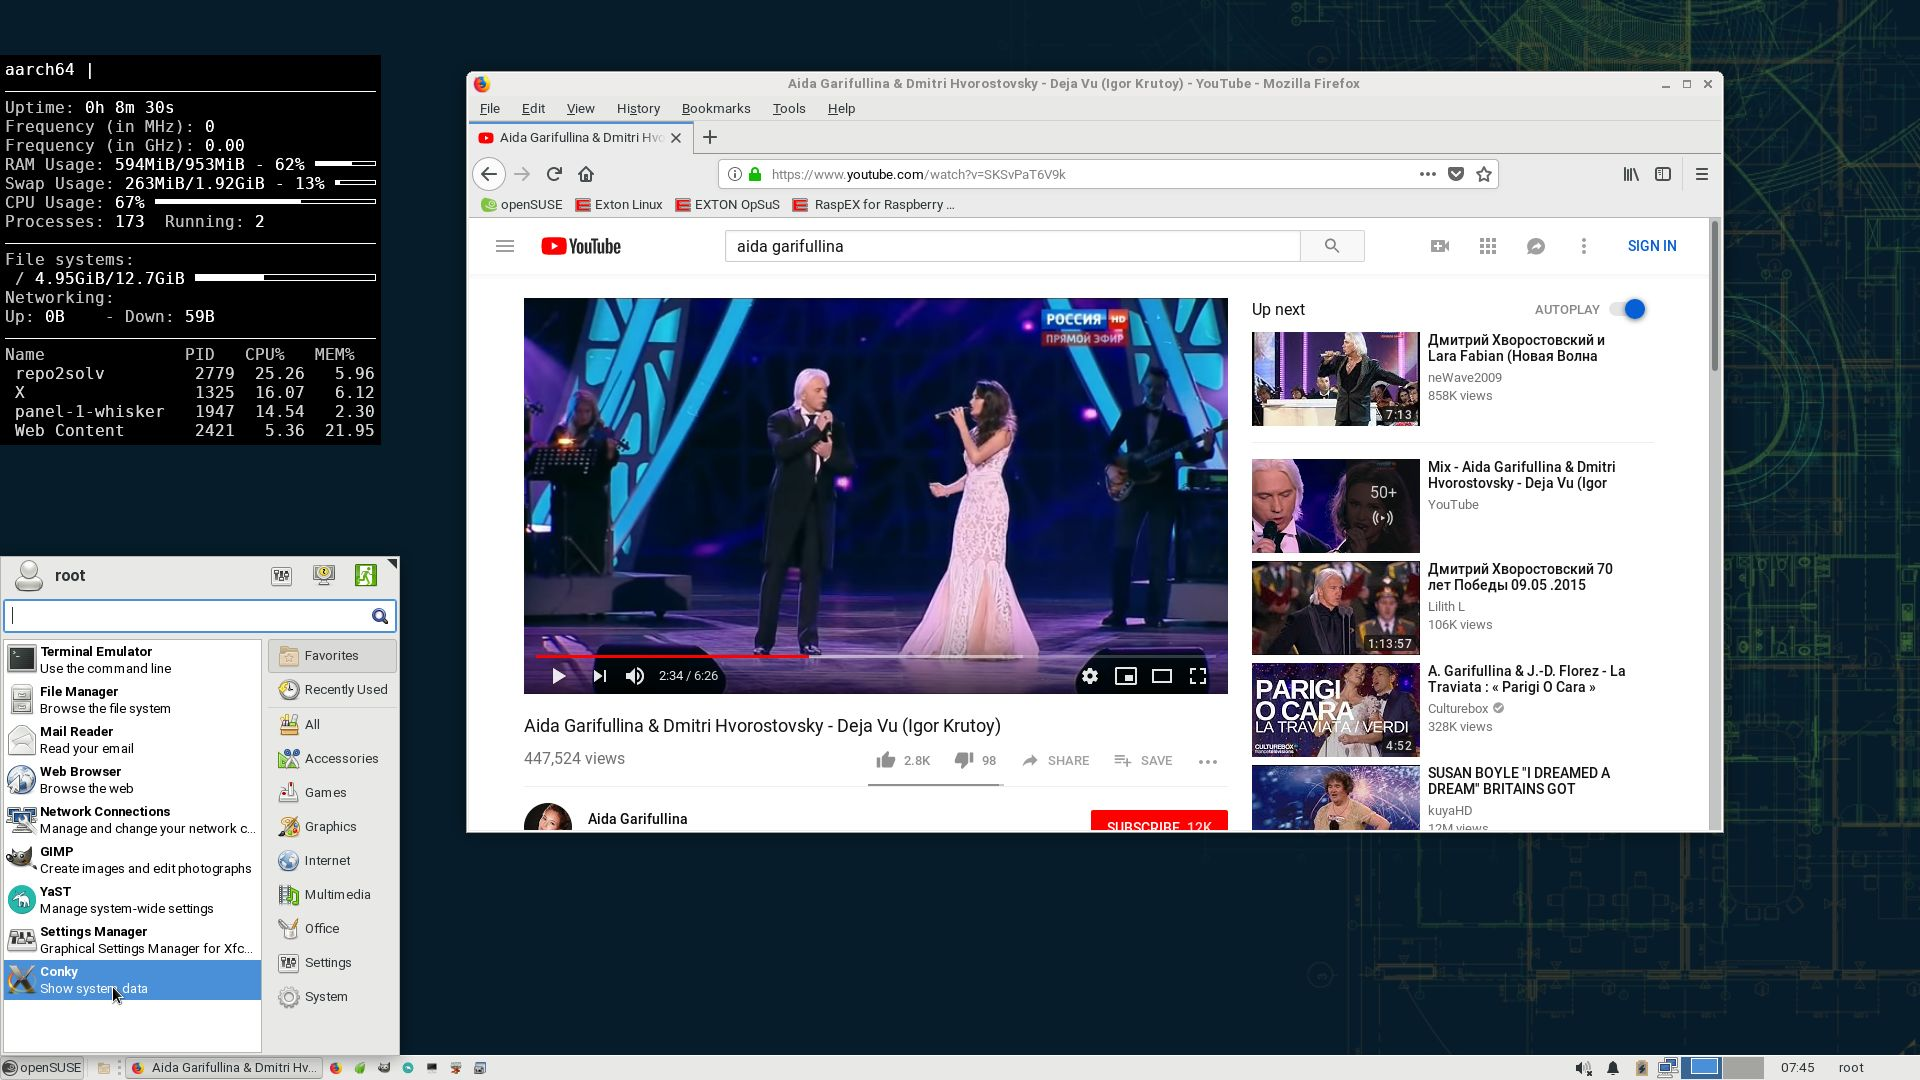 CULTUREBOX TÉLÉCHARGER MAC VIDEO